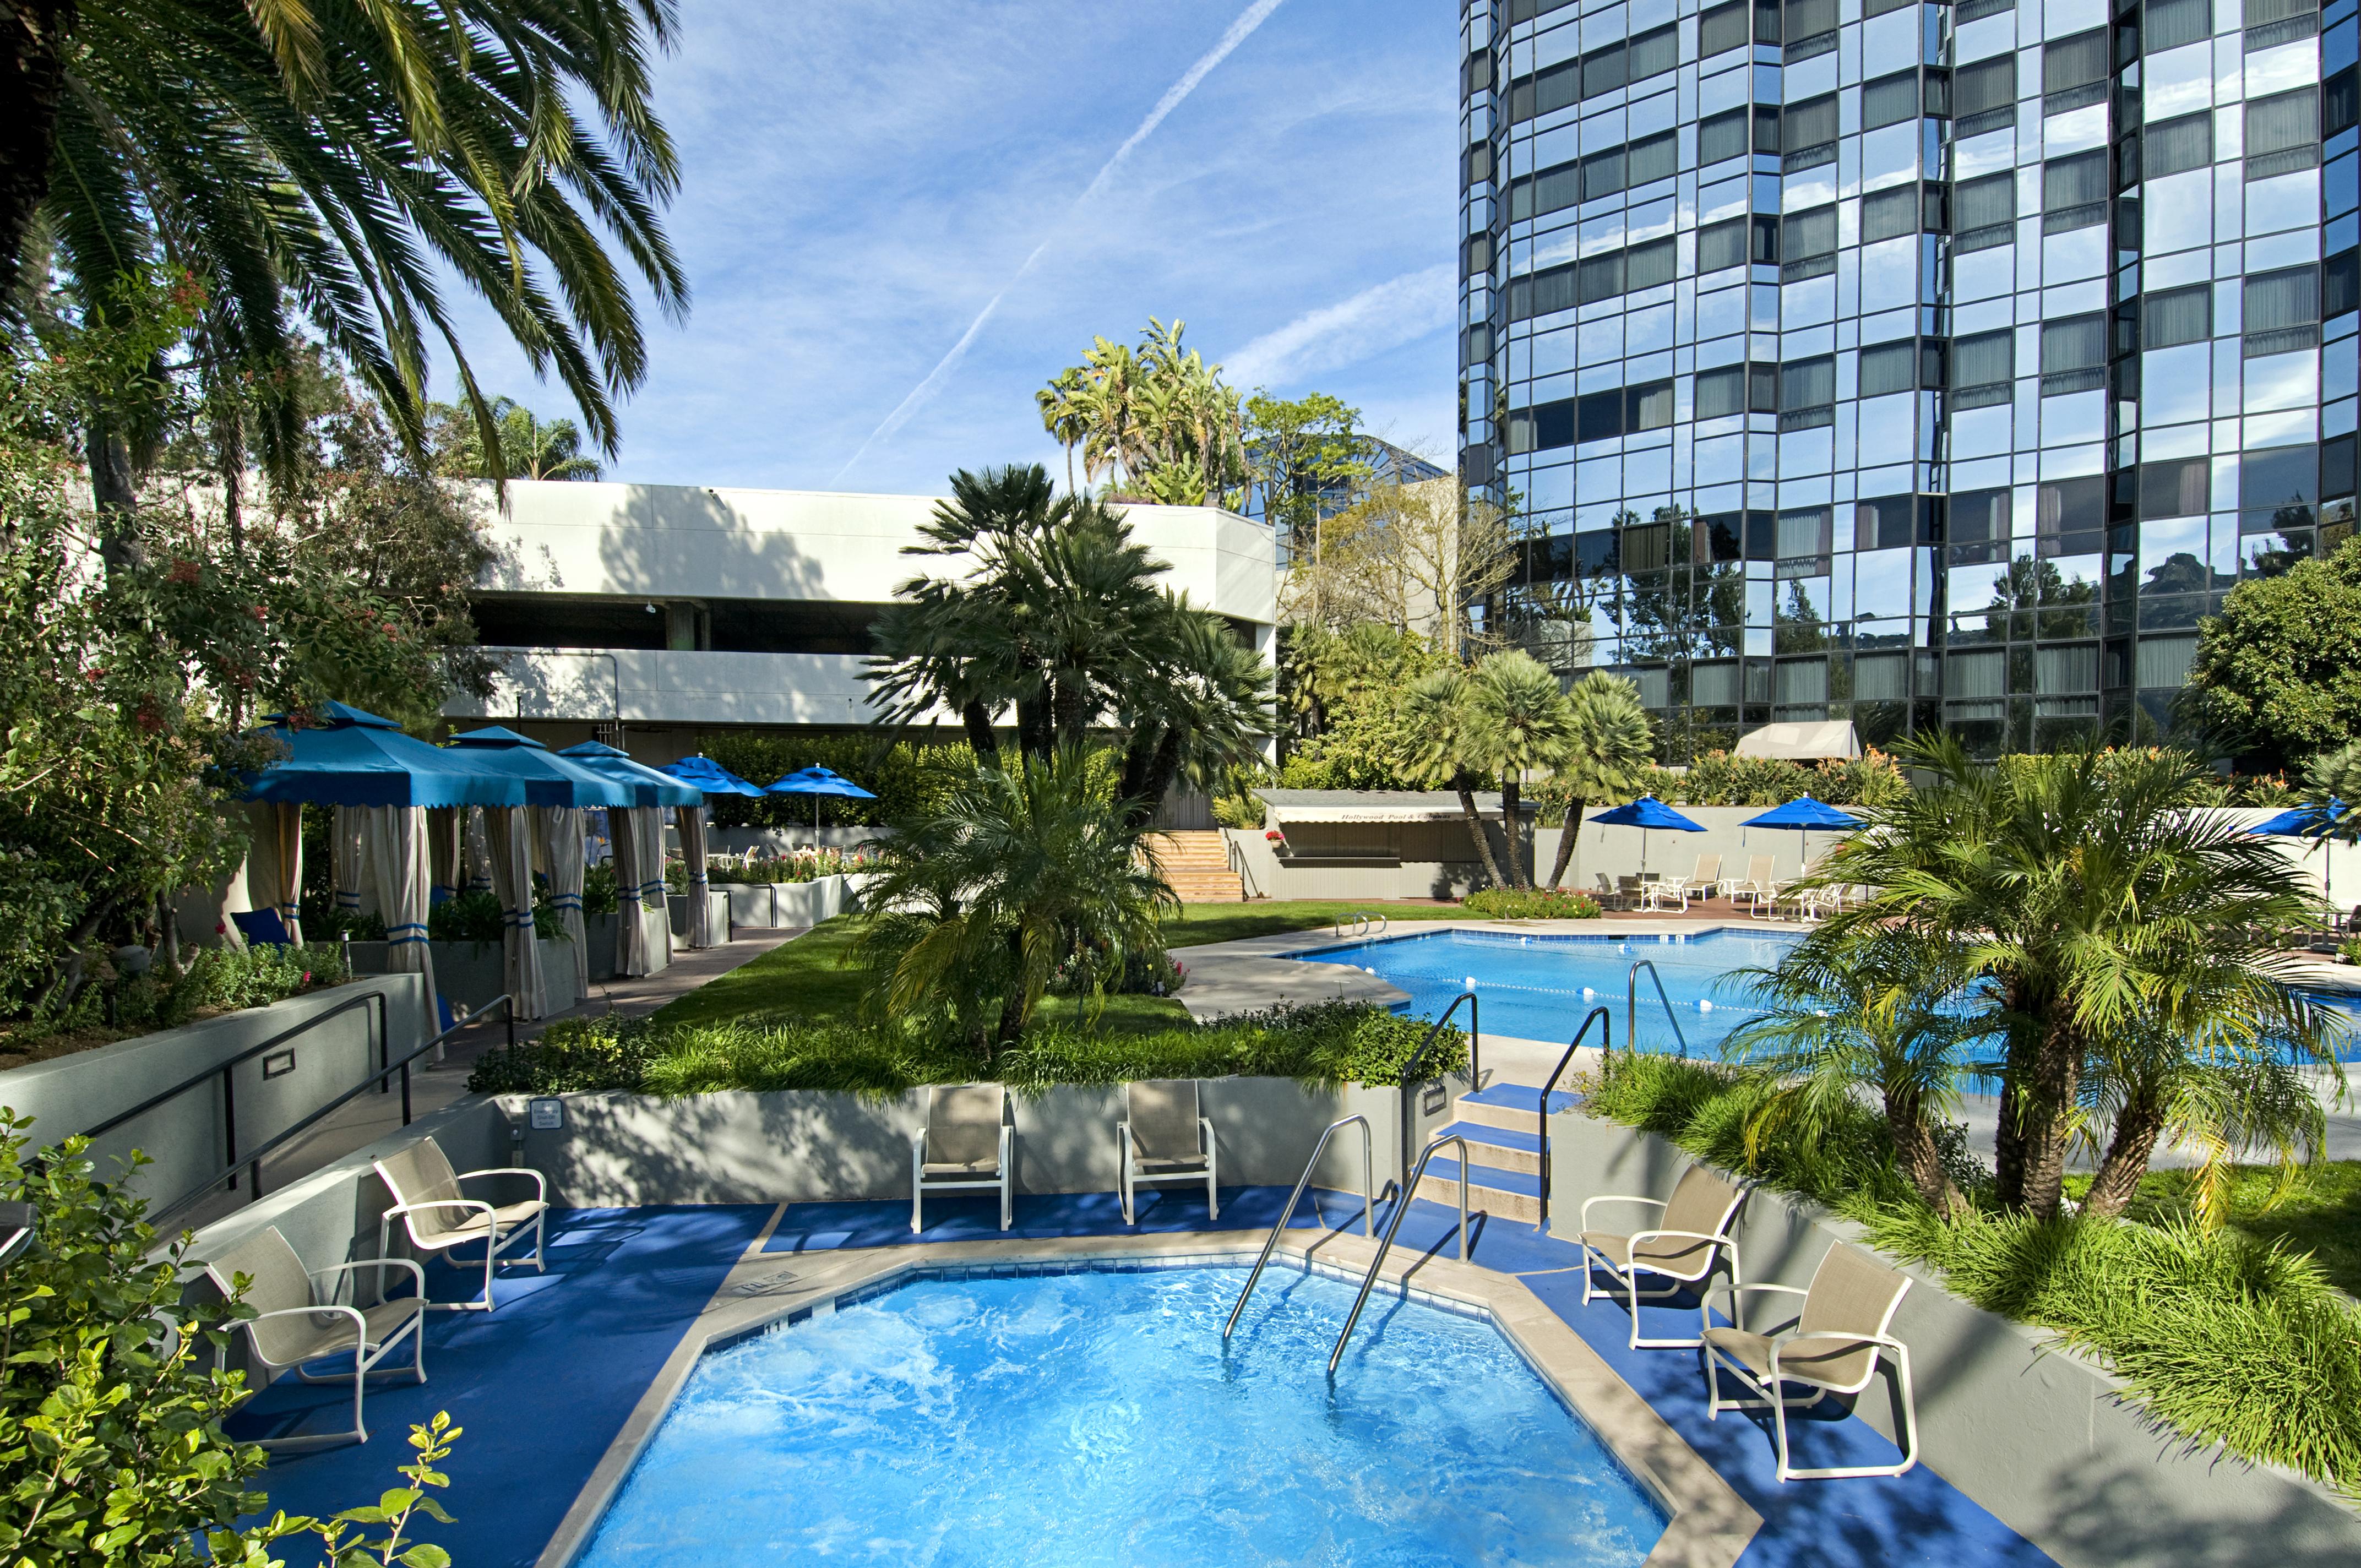 Hotels Near Universal Studios Hollywood